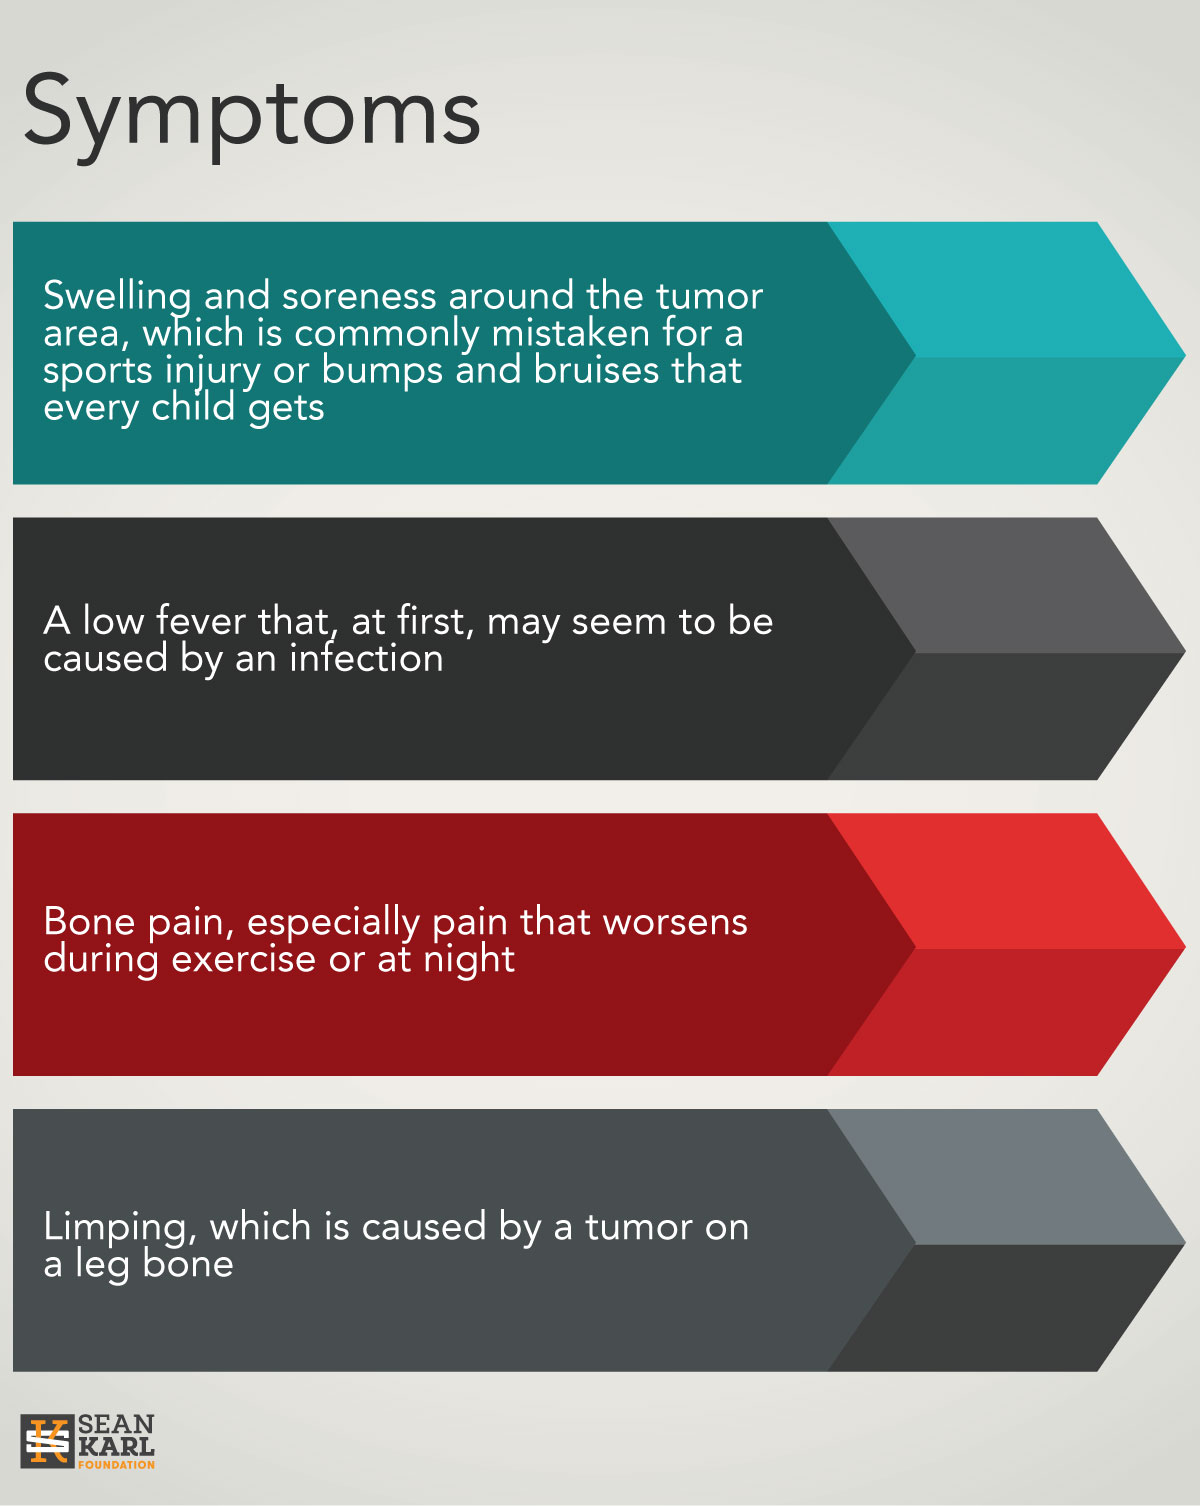 Symptoms of Ewing's Sarcoma